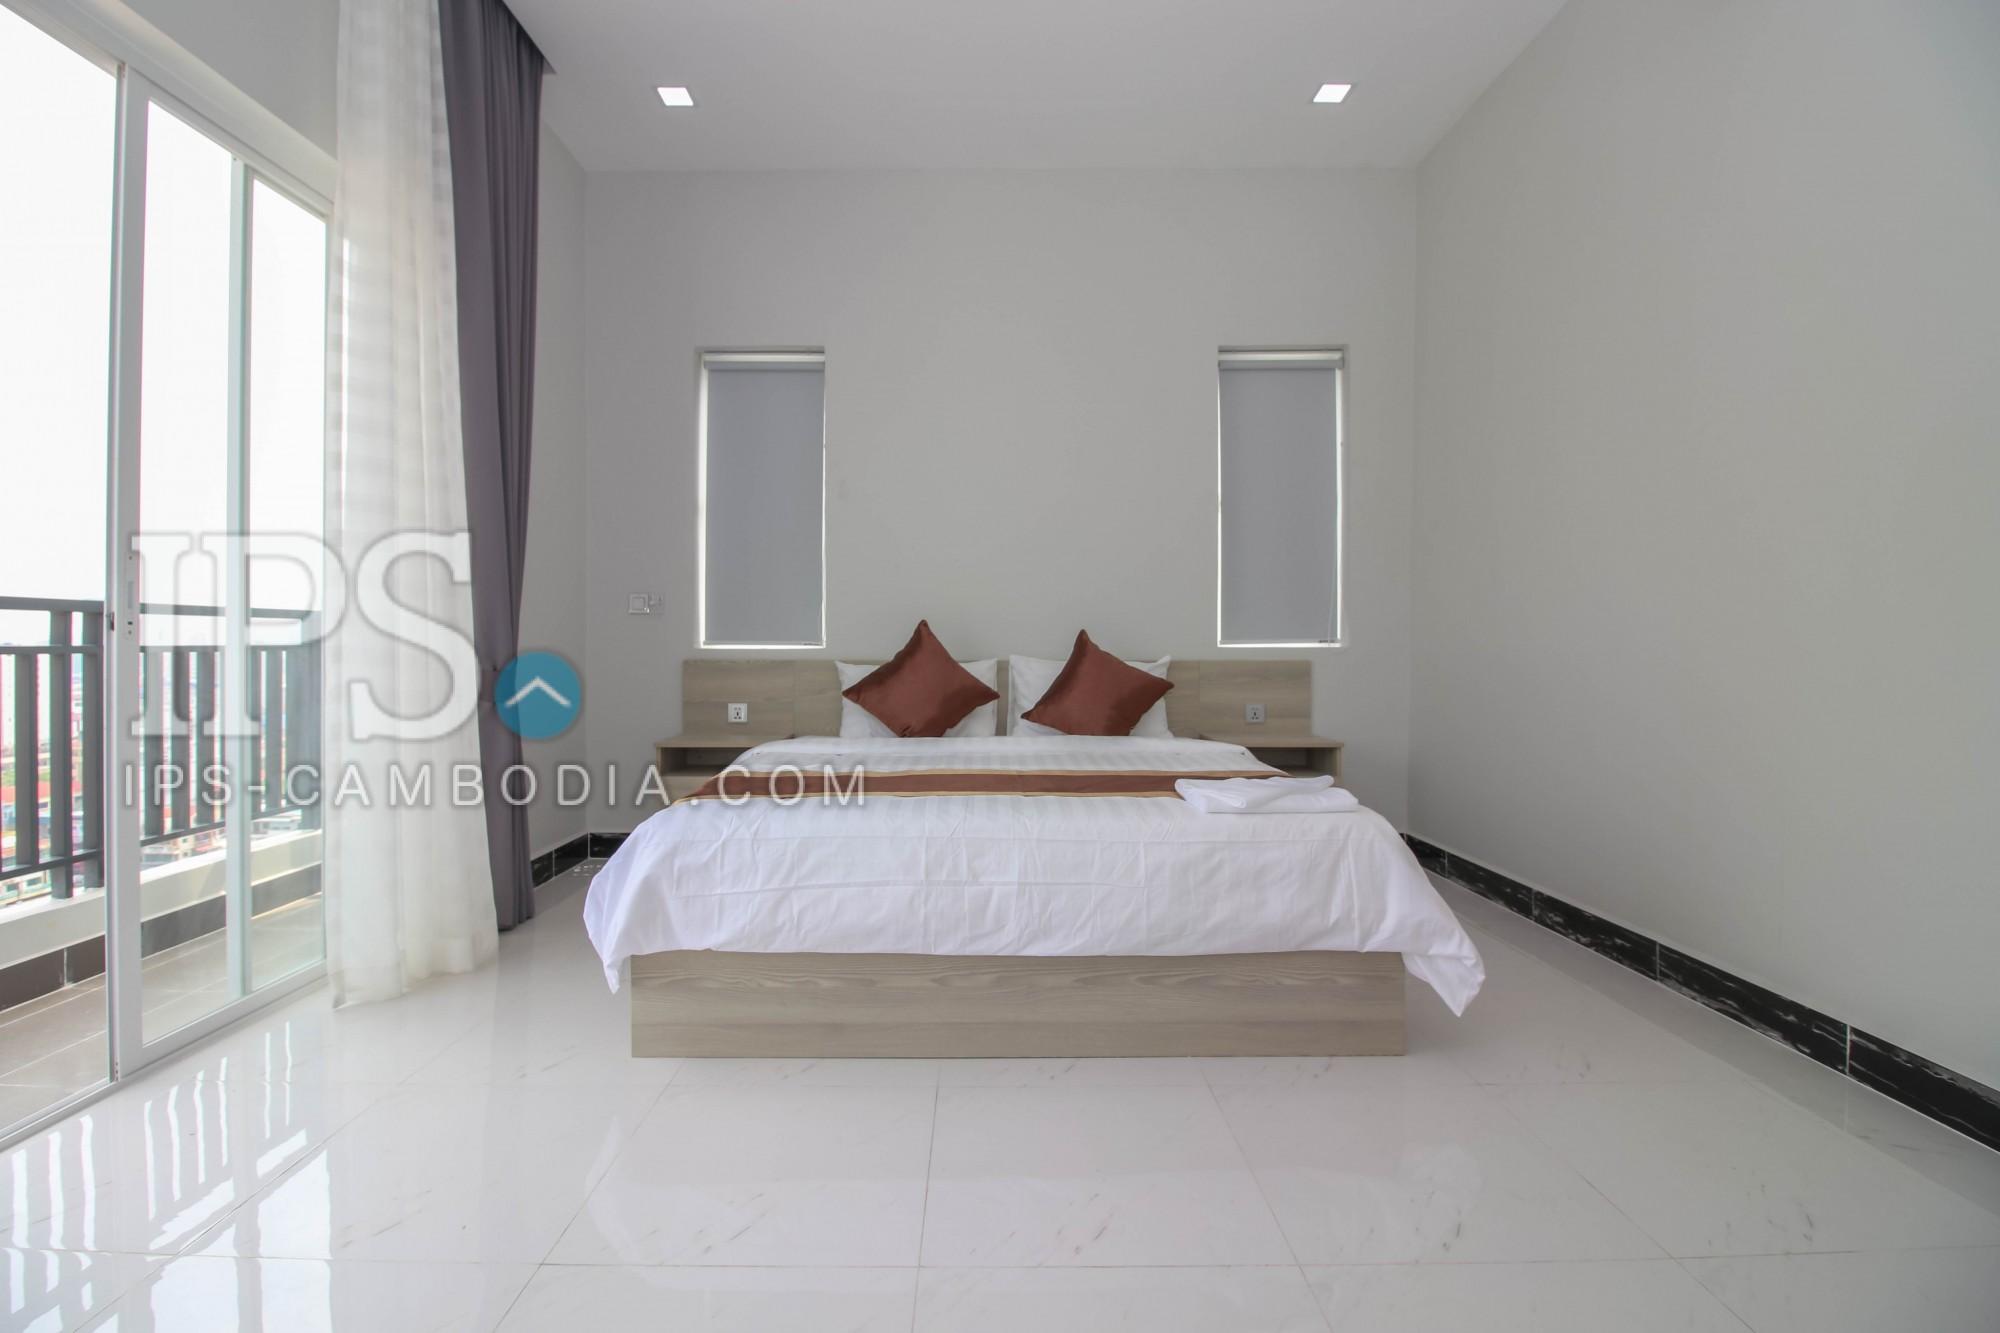 1 Bedroom Apartment For Rent - Russian Market